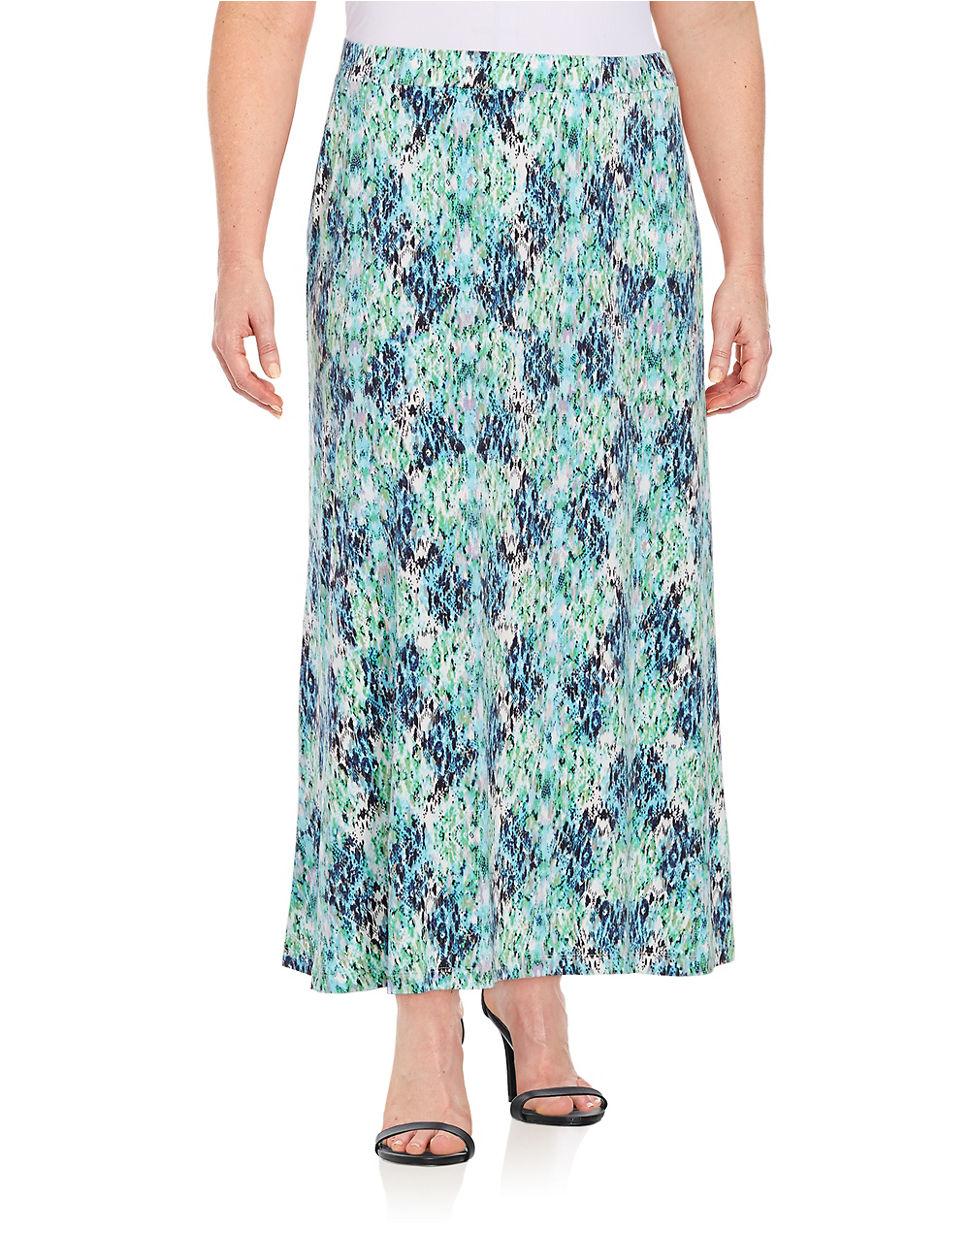 nipon boutique plus ikat maxi skirt lyst